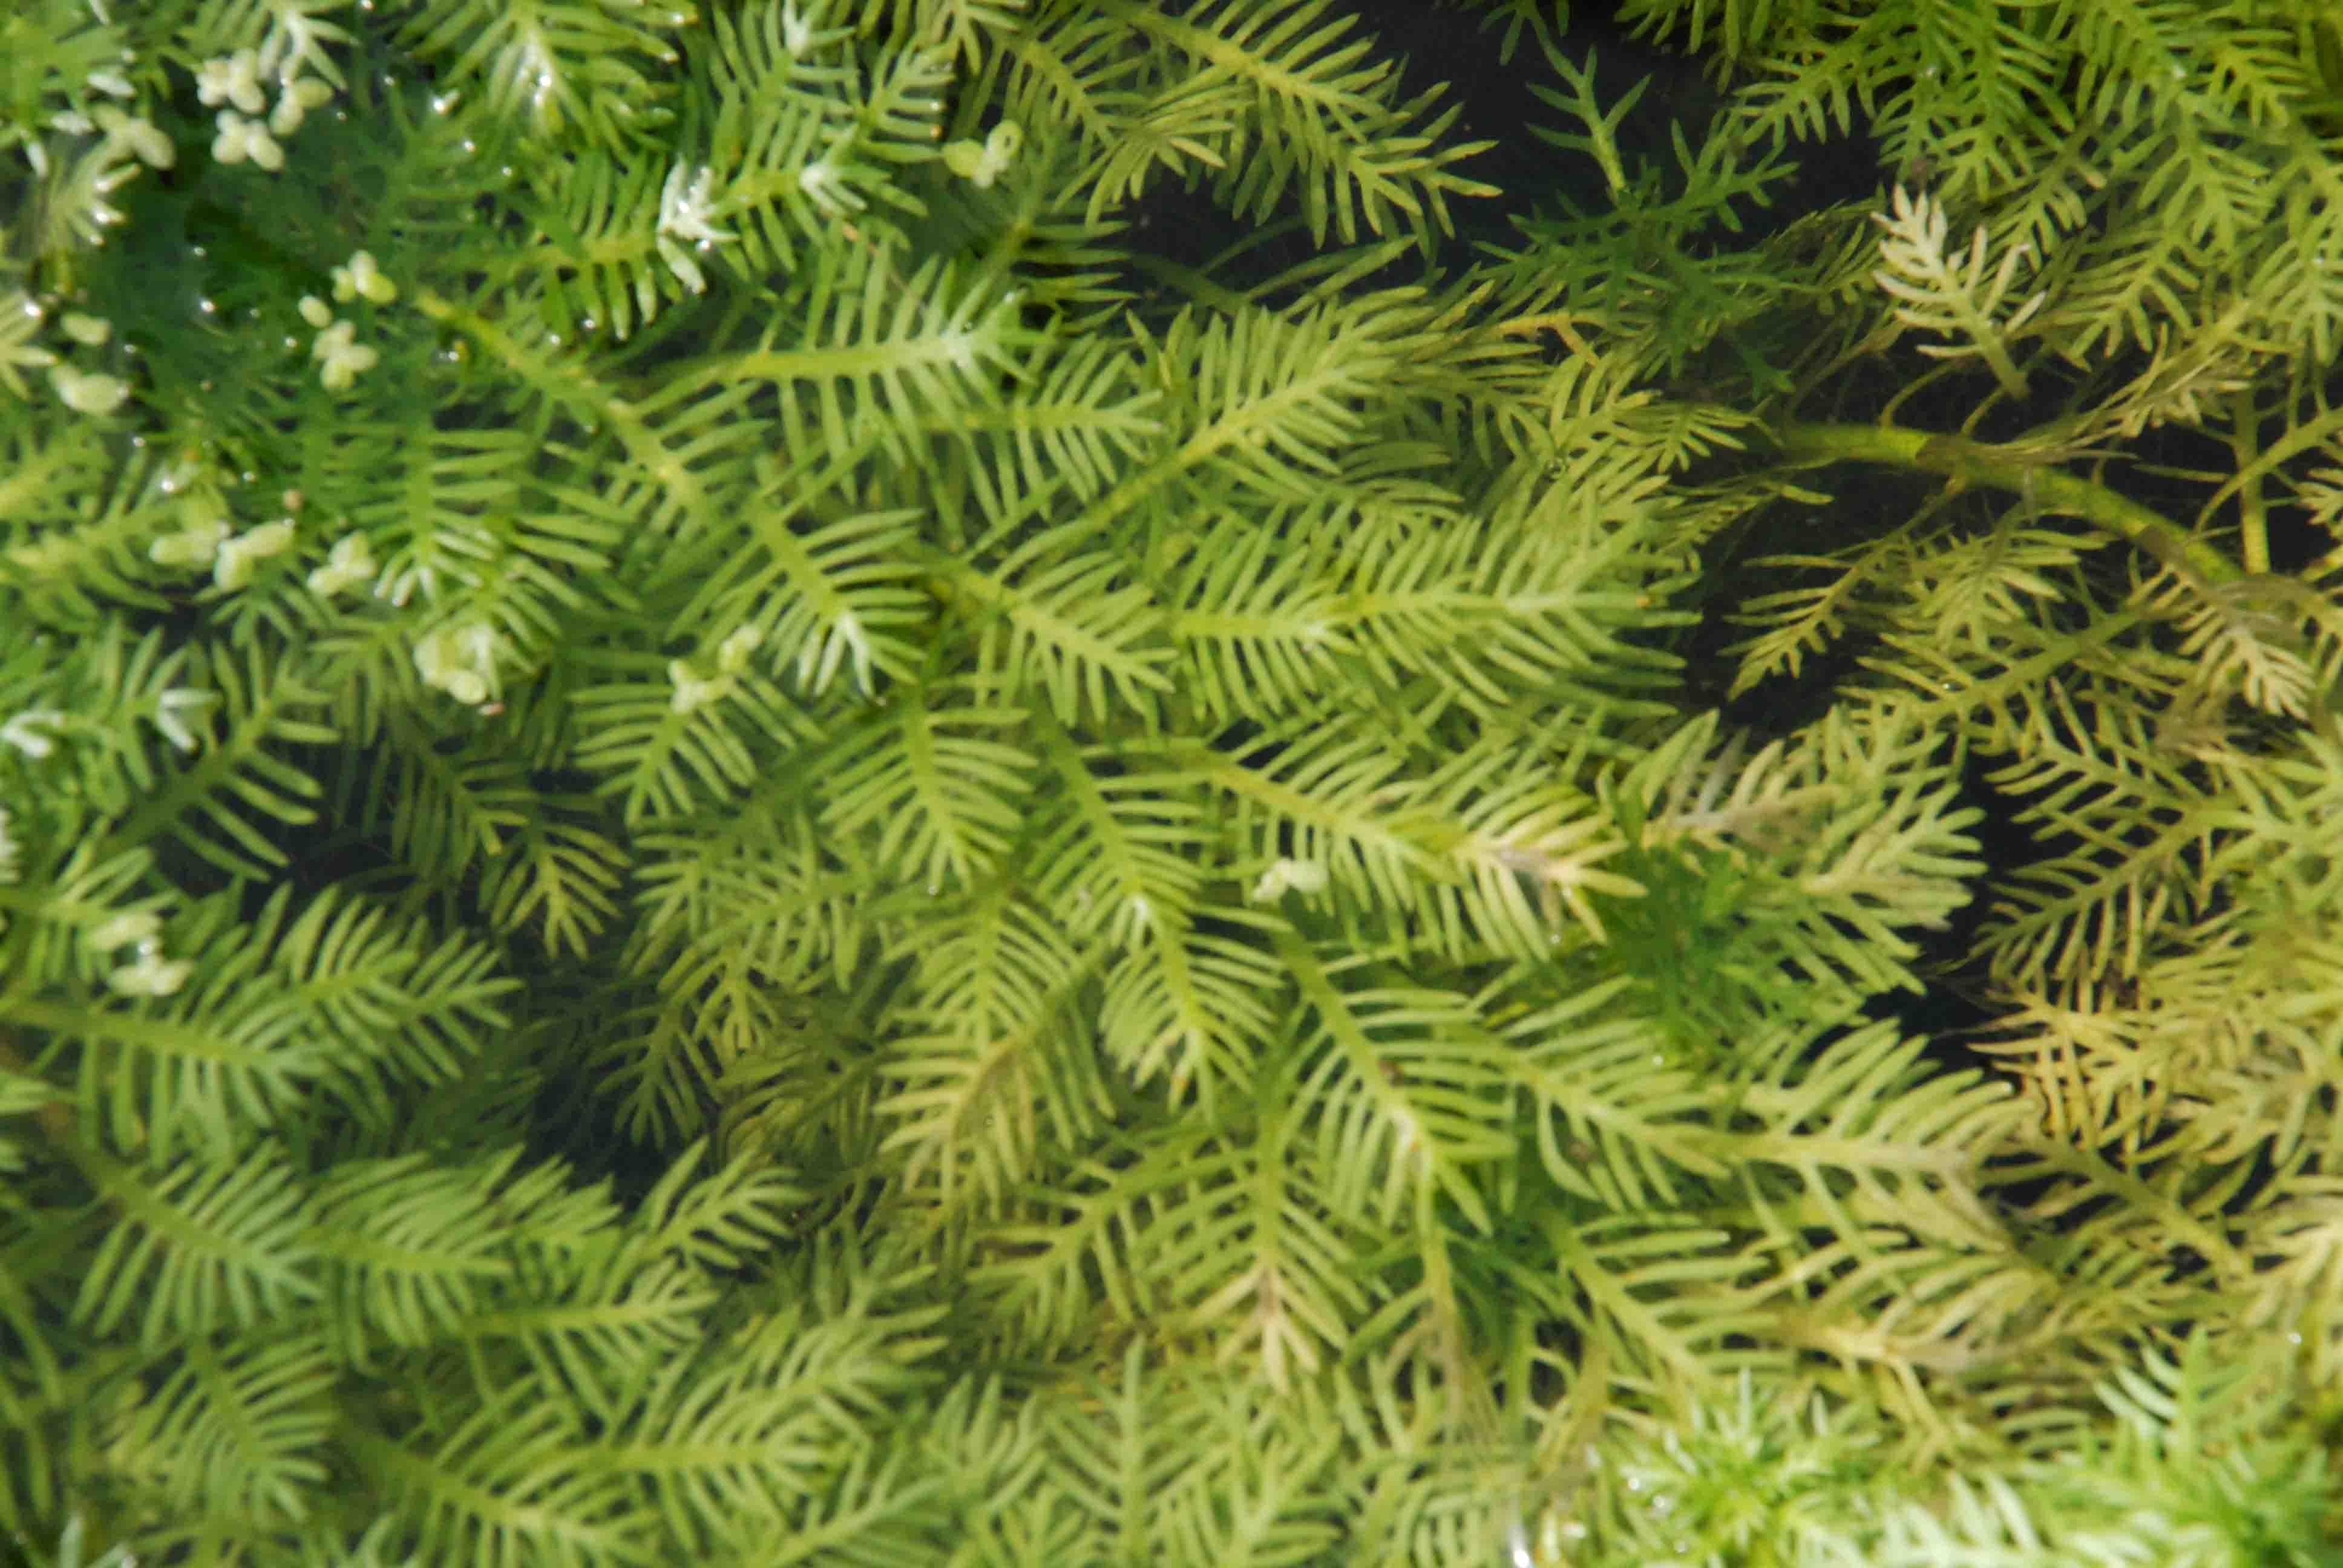 hottonia palustris plante oxyg nante petit bassin le jardin d 39 eau. Black Bedroom Furniture Sets. Home Design Ideas